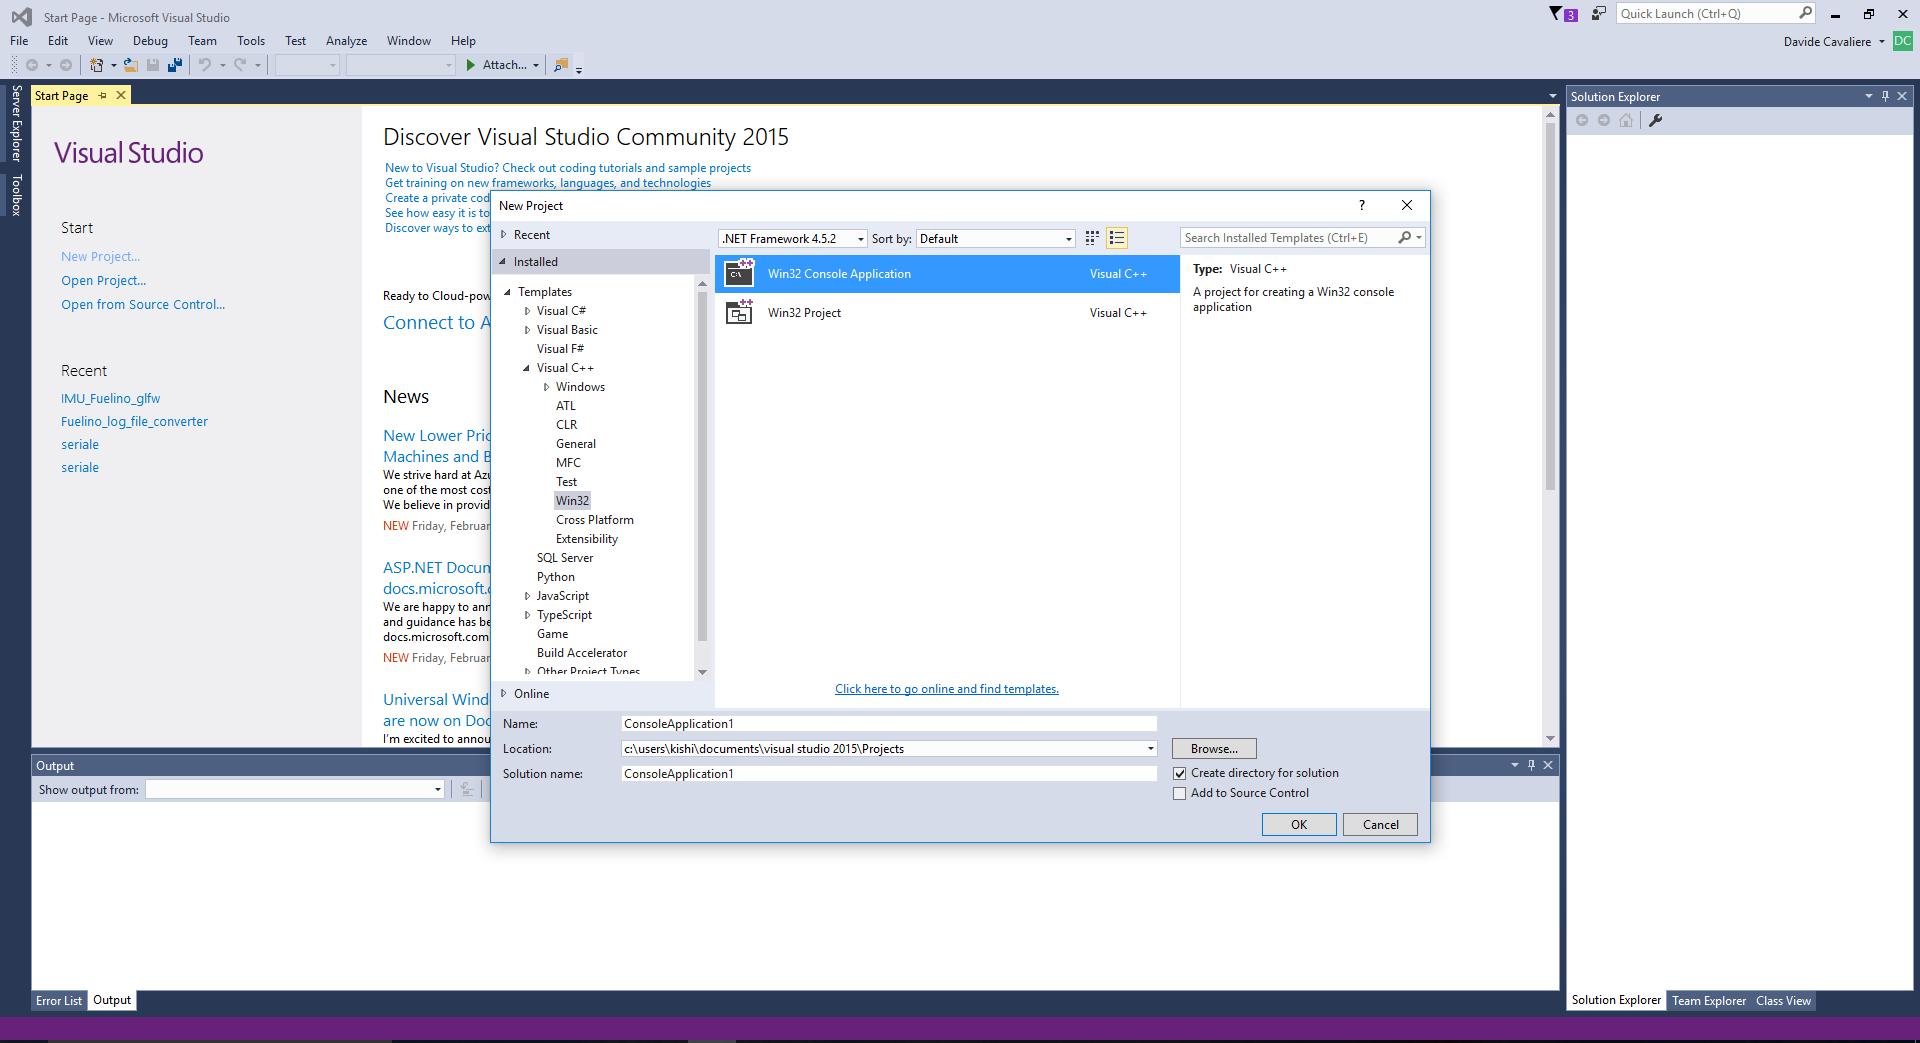 Explorer exe is not a valid win32 application windows 7 | Peatix